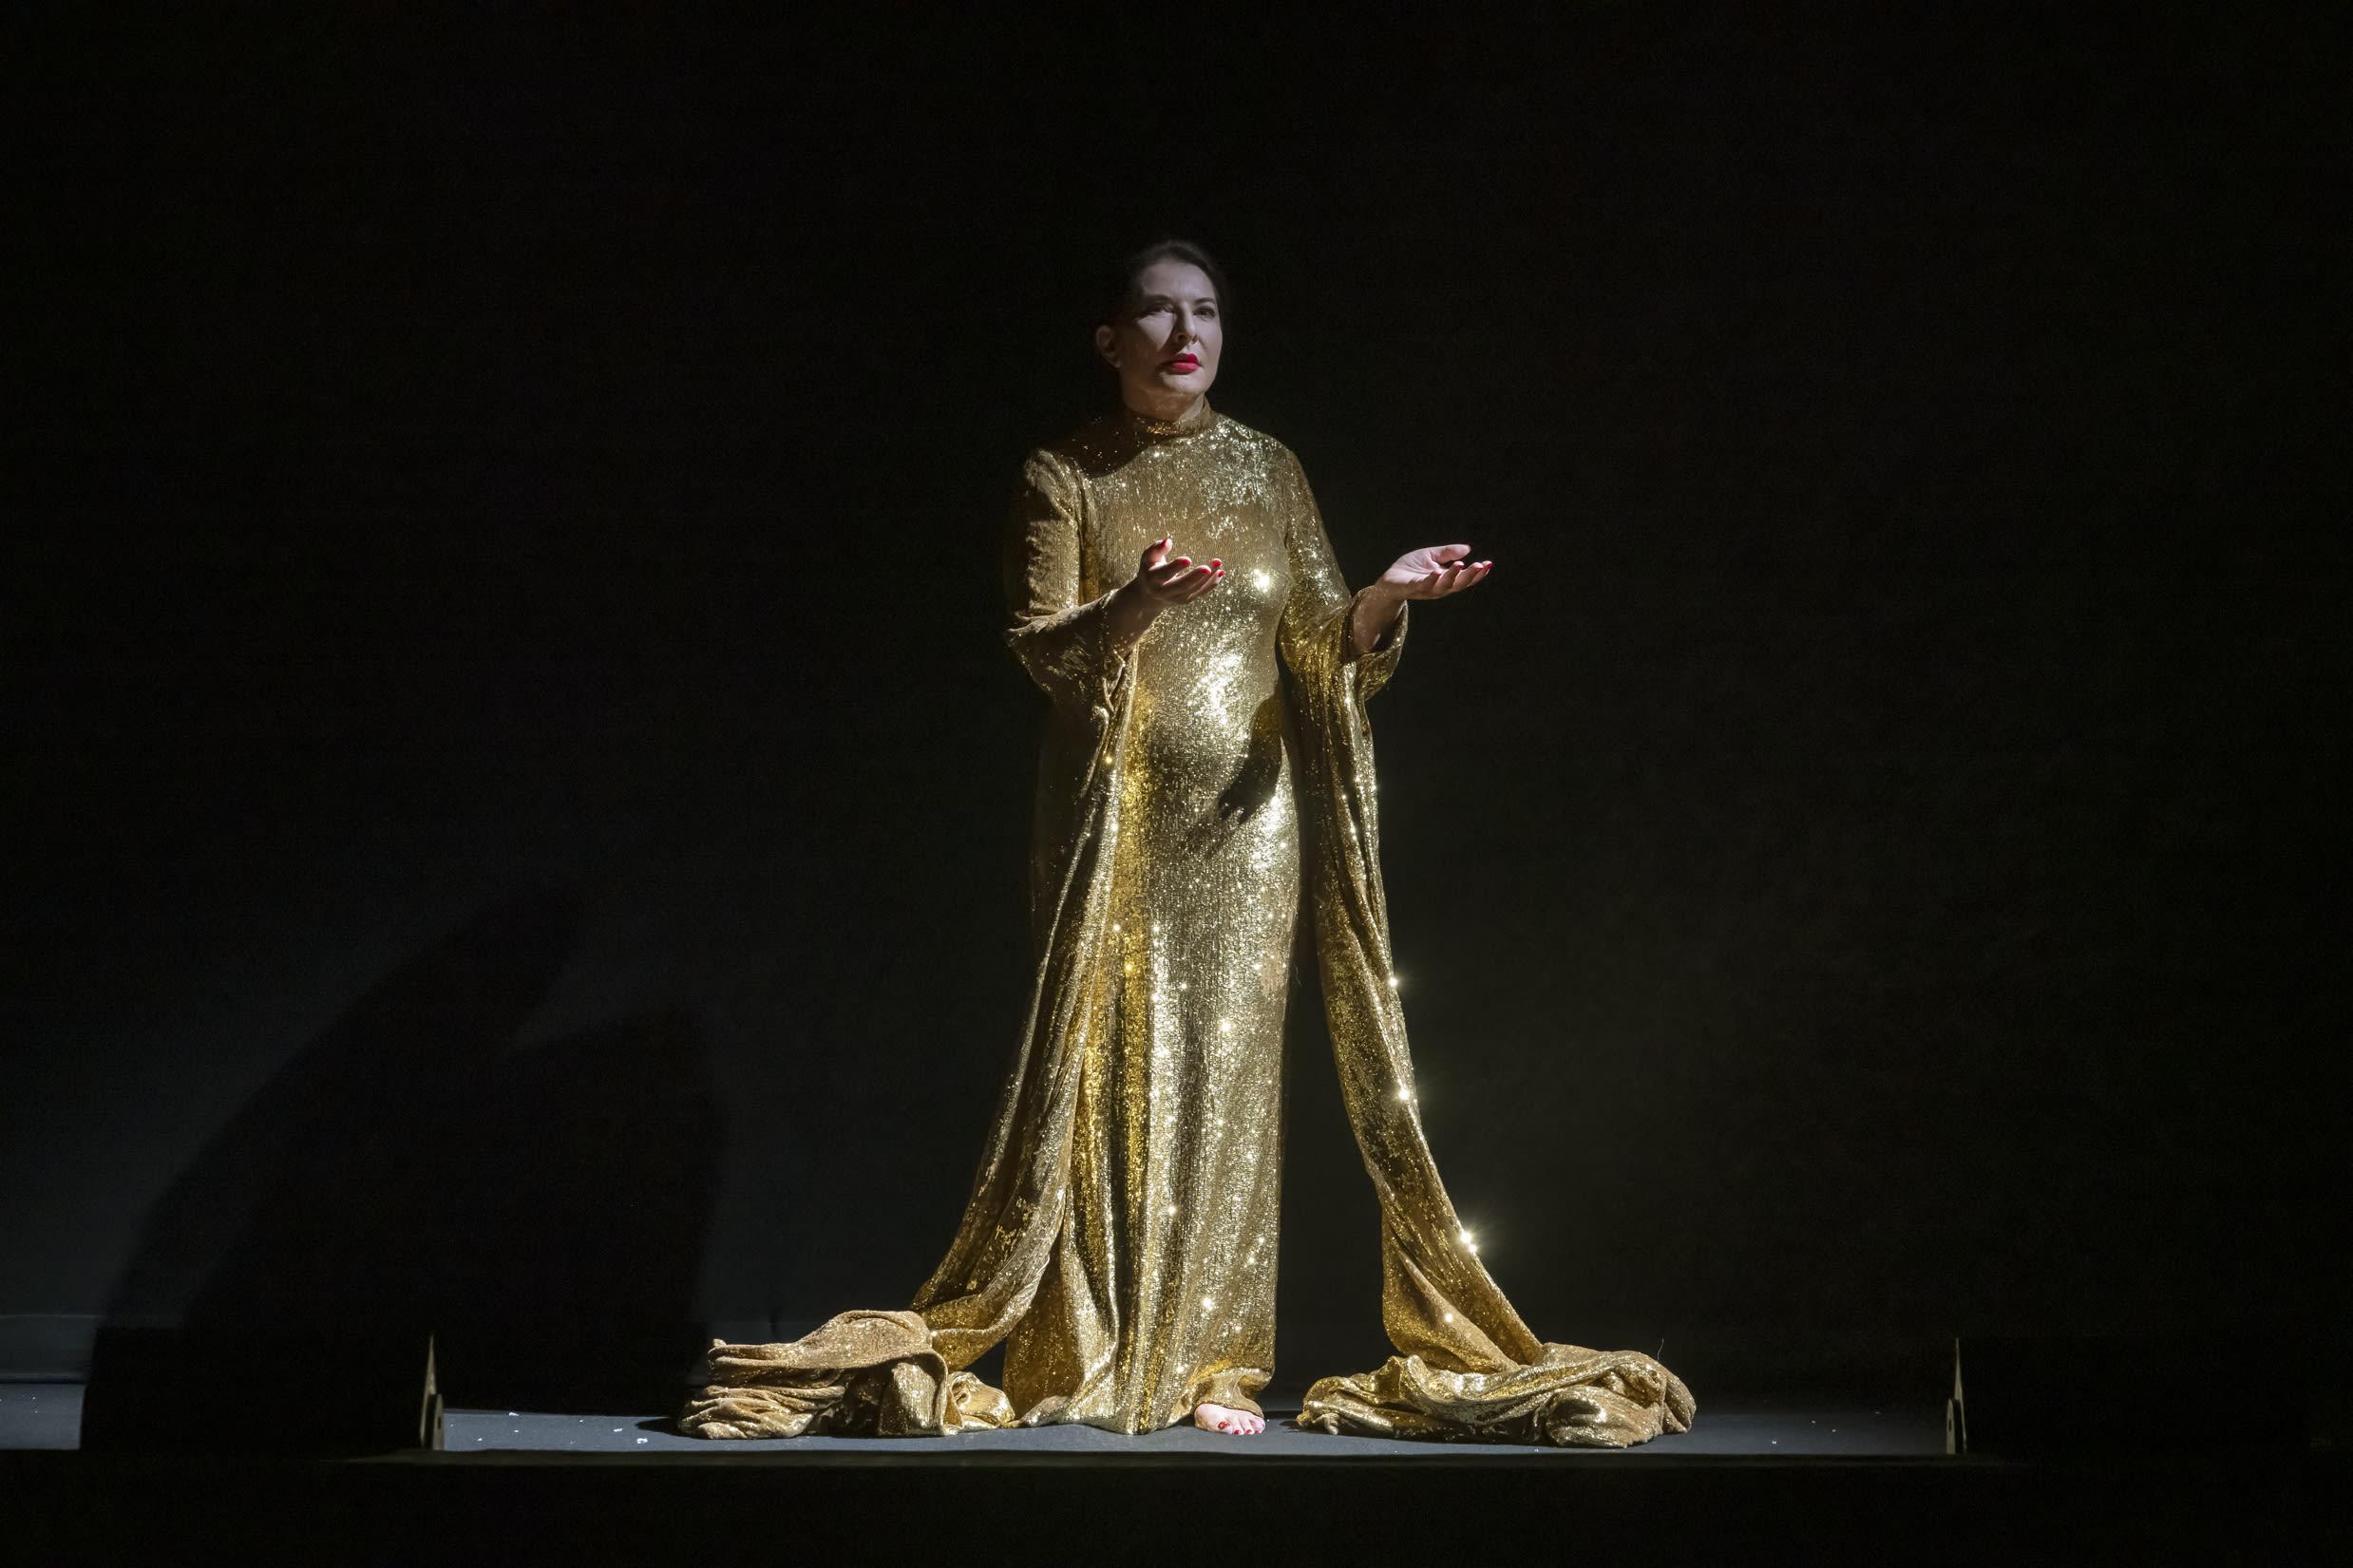 7 Deaths of Maria Callas 21-22 © Charles Duprat - OnP (25)